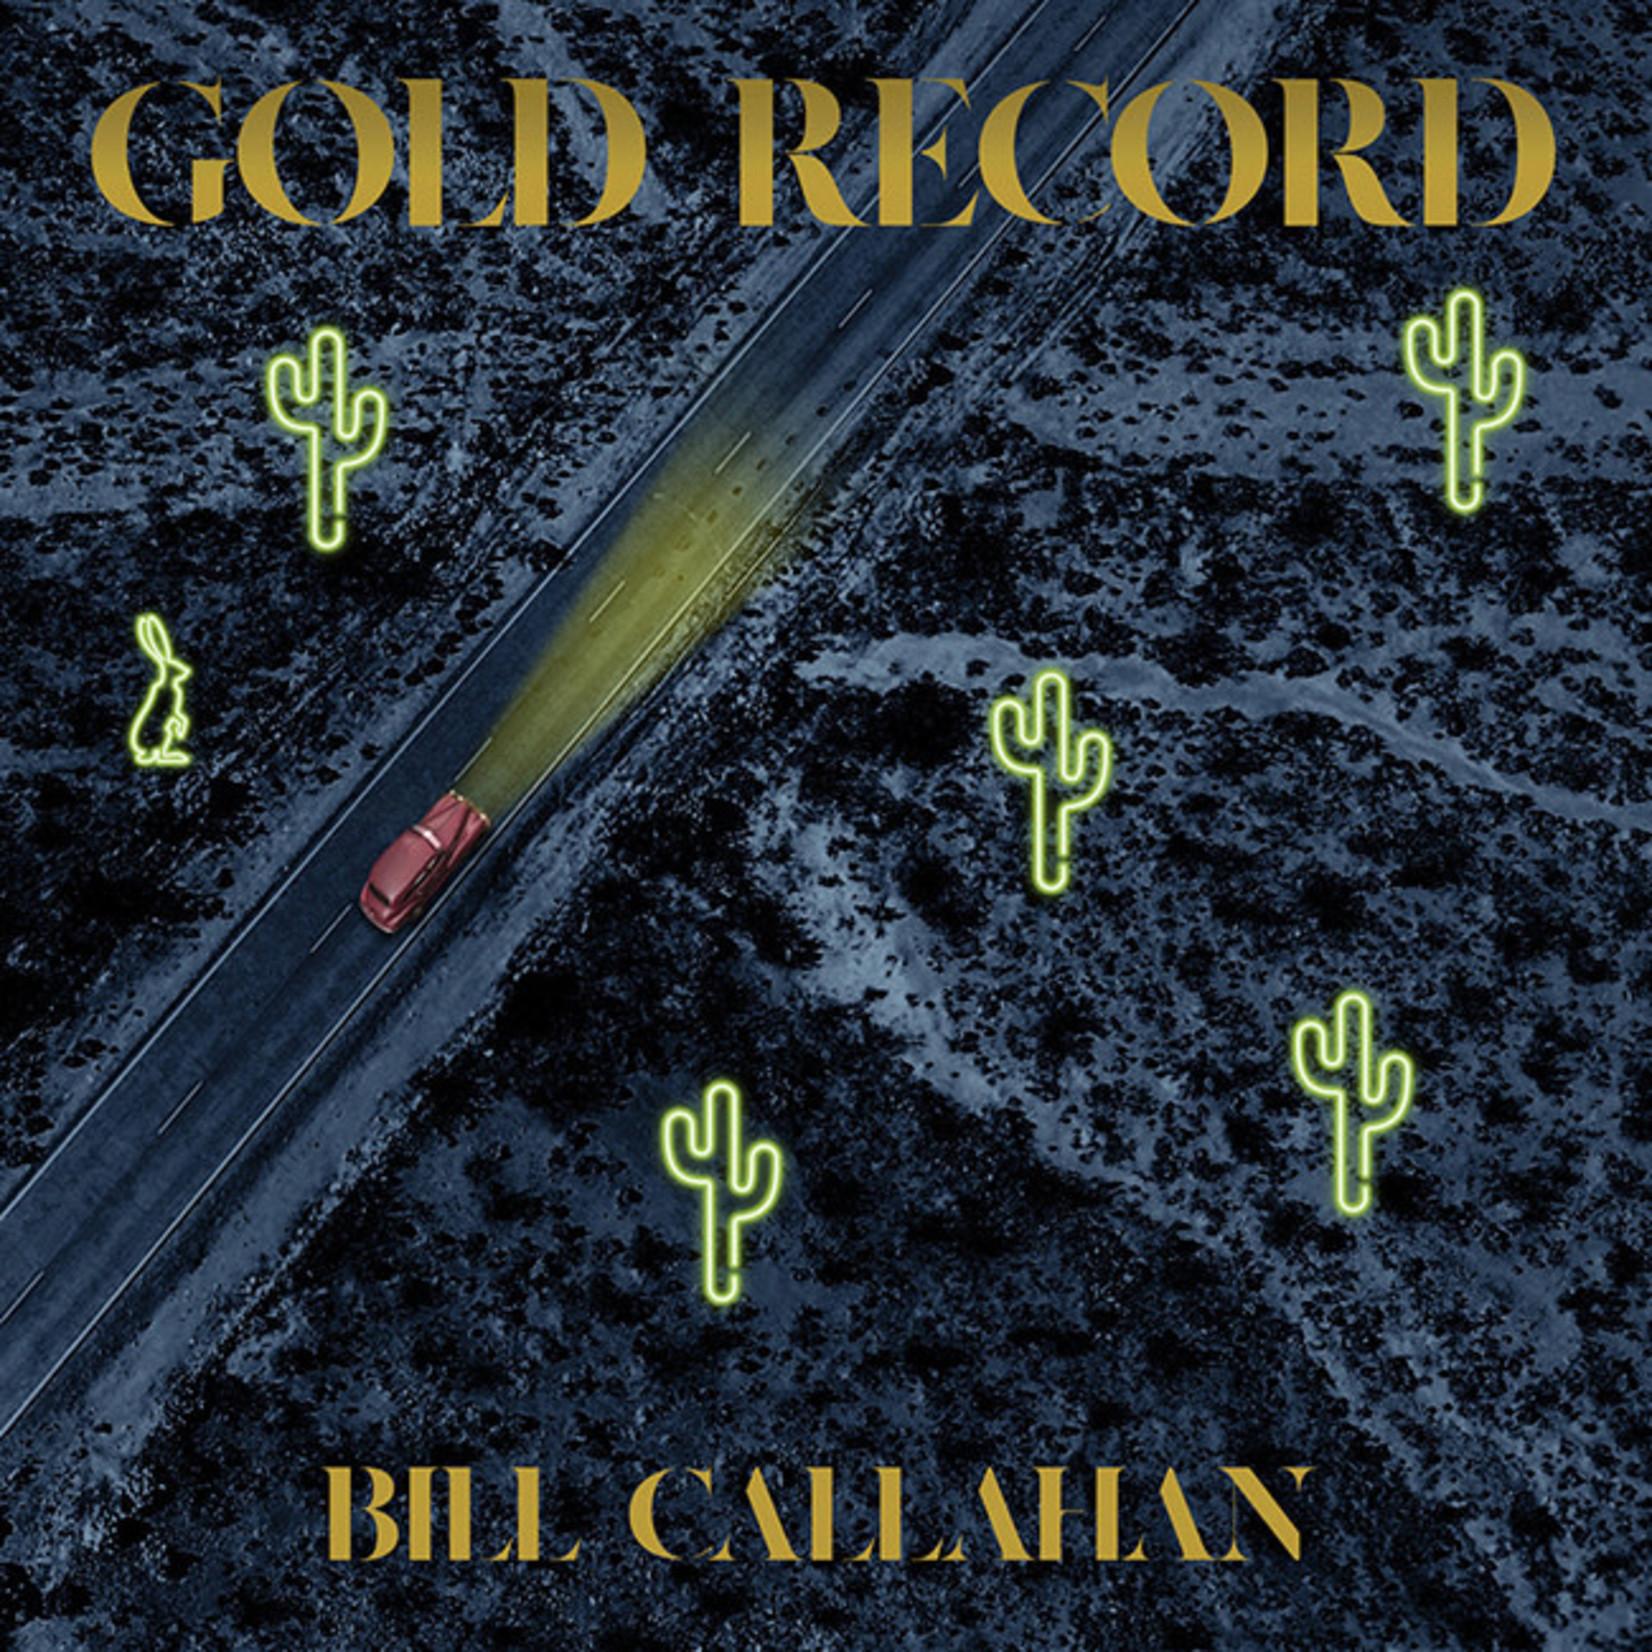 [New] Callahan, Bill: Gold